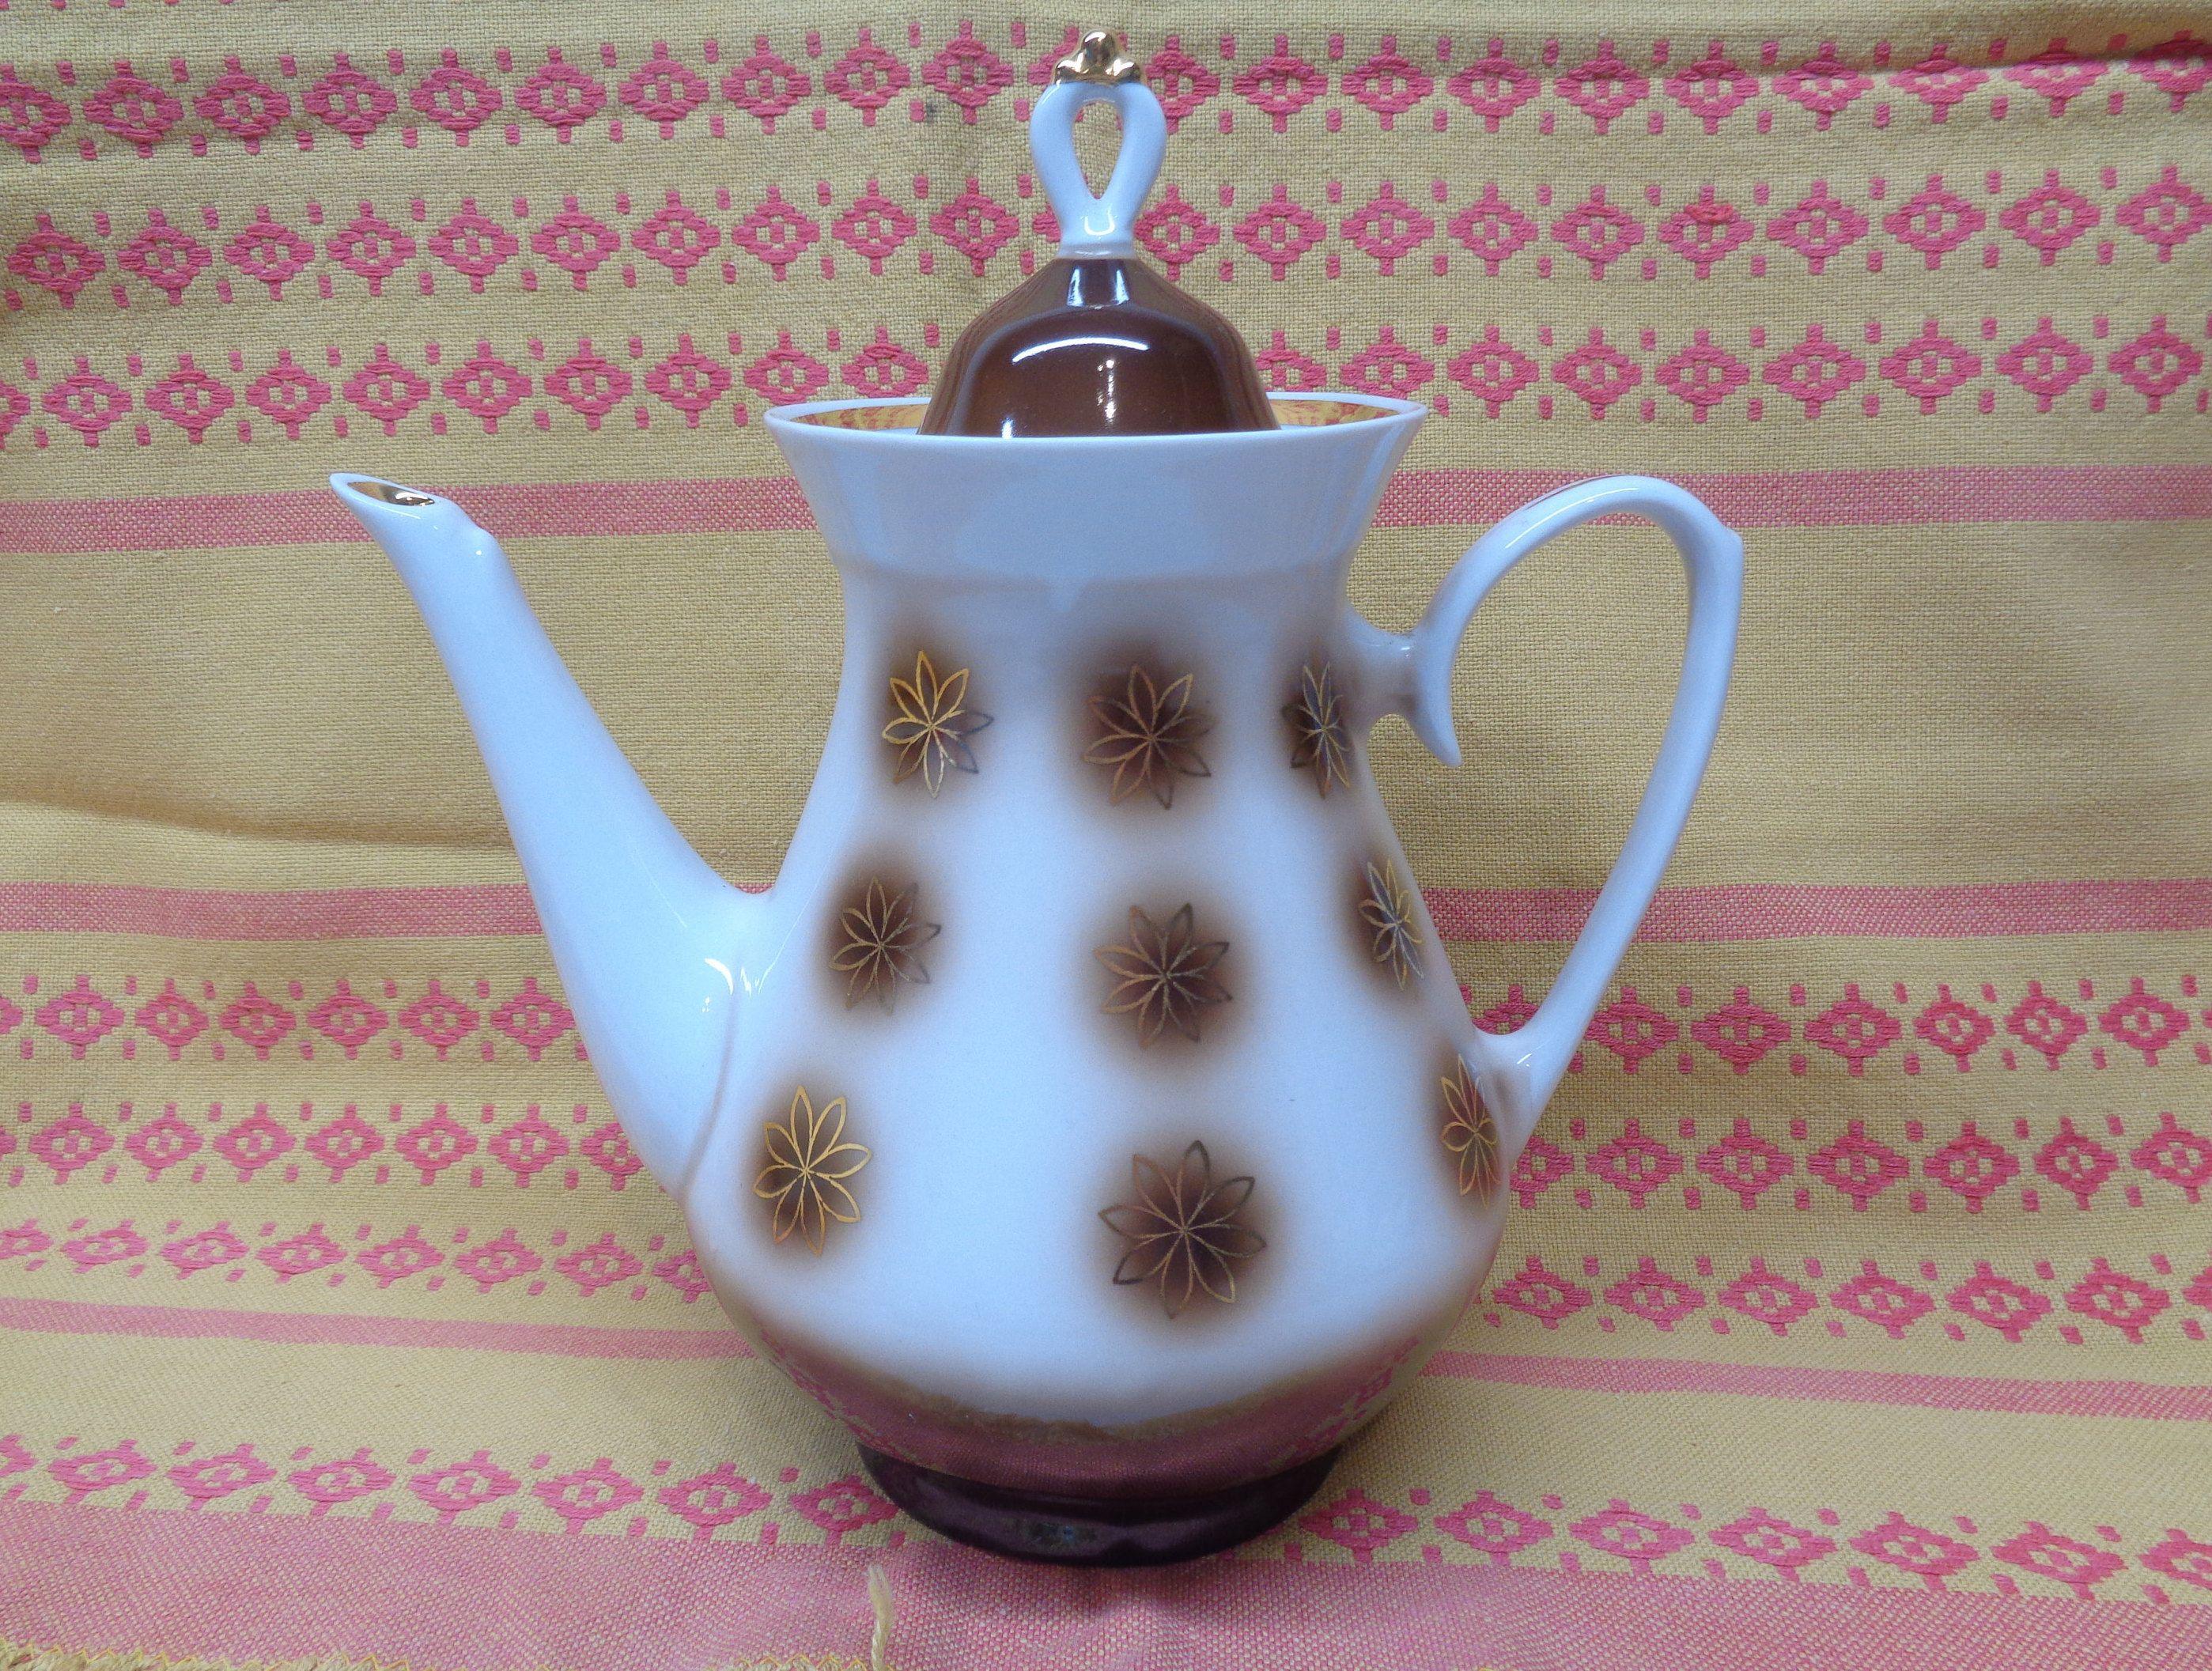 Soviet Vintage Coffee Pot; Retro Porcelain Coffee Pot